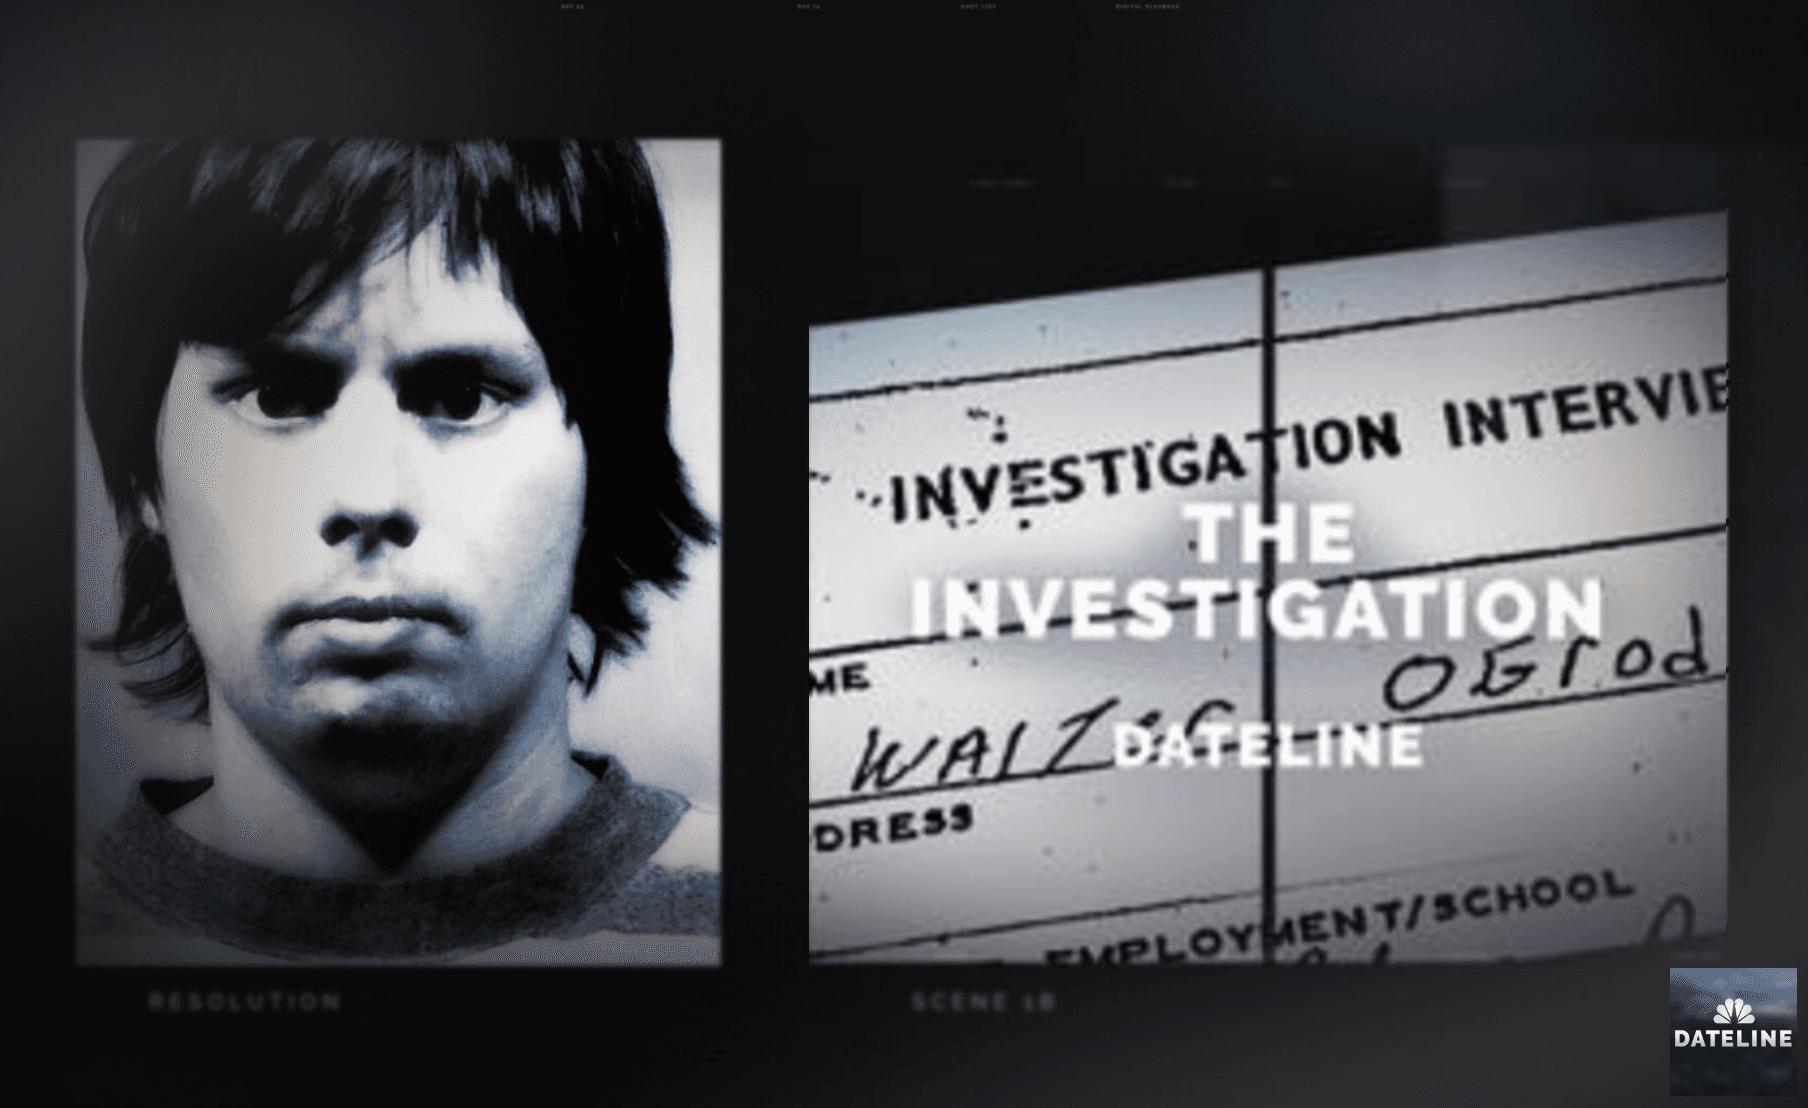 NBC's 'Dateline' Investigates the Wrongful Capital Conviction of Death-Row Exoneree Walter Ogrod